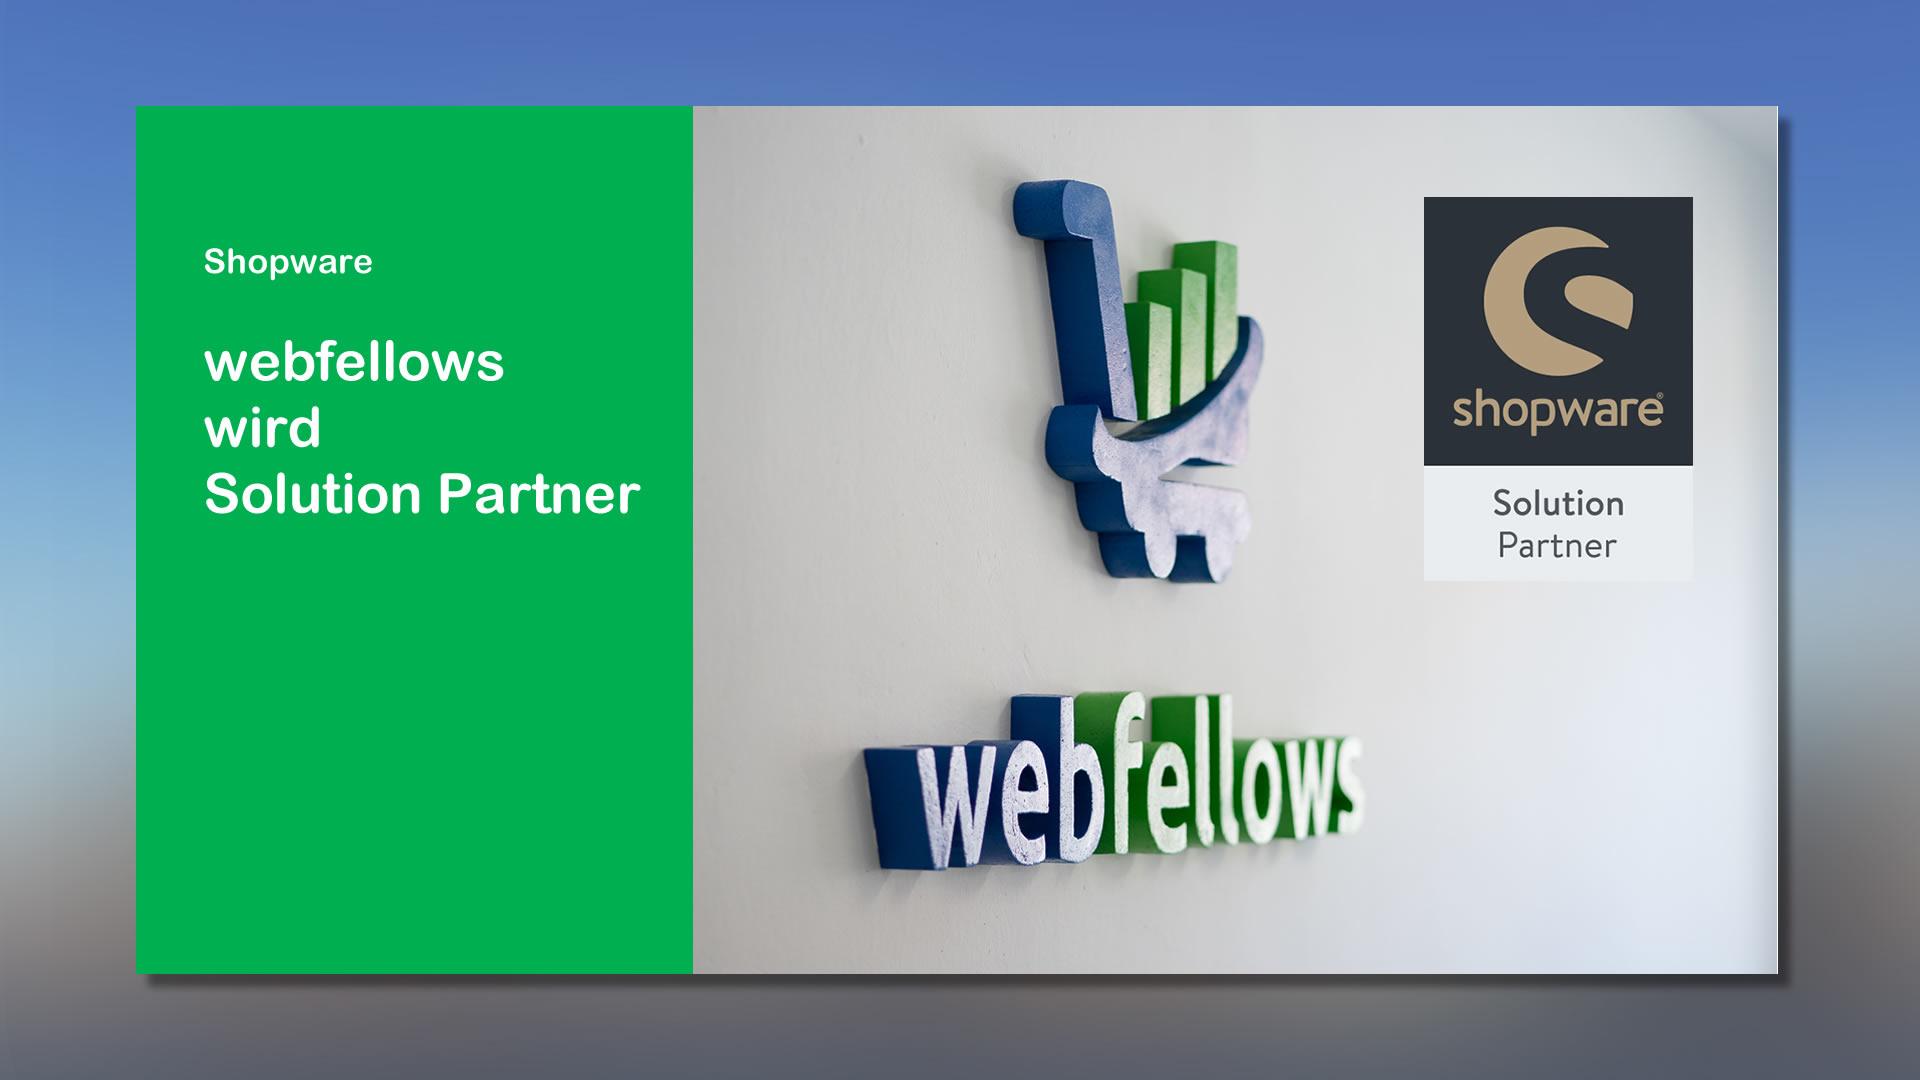 webfellows wird Shopware Solution Partner